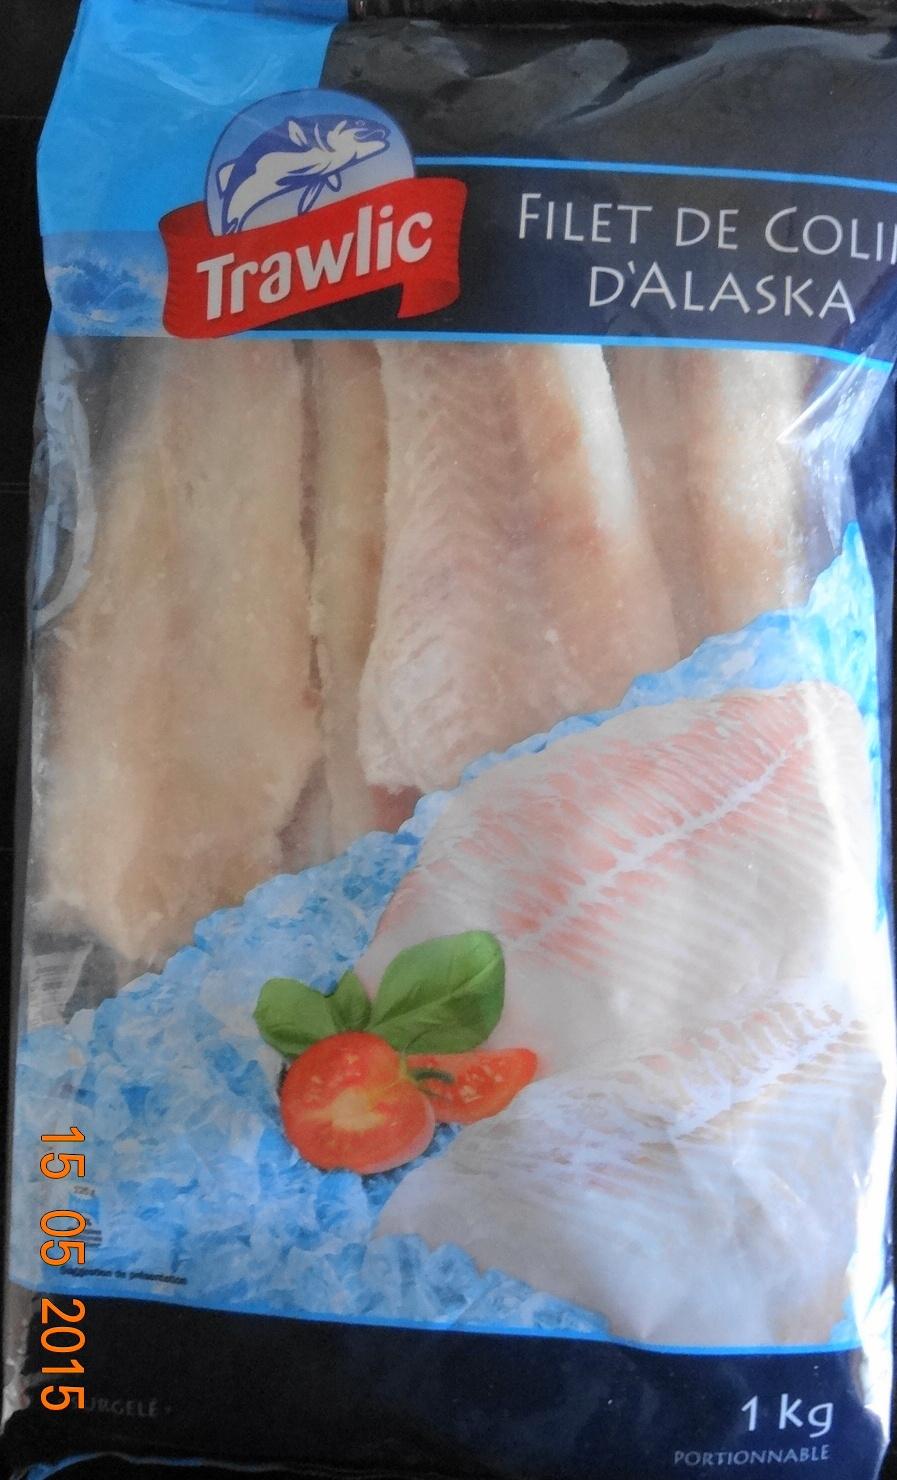 Filet de colin dalaska surgel trawlic 1 kg soit 8 - Cuisiner du colin surgele ...